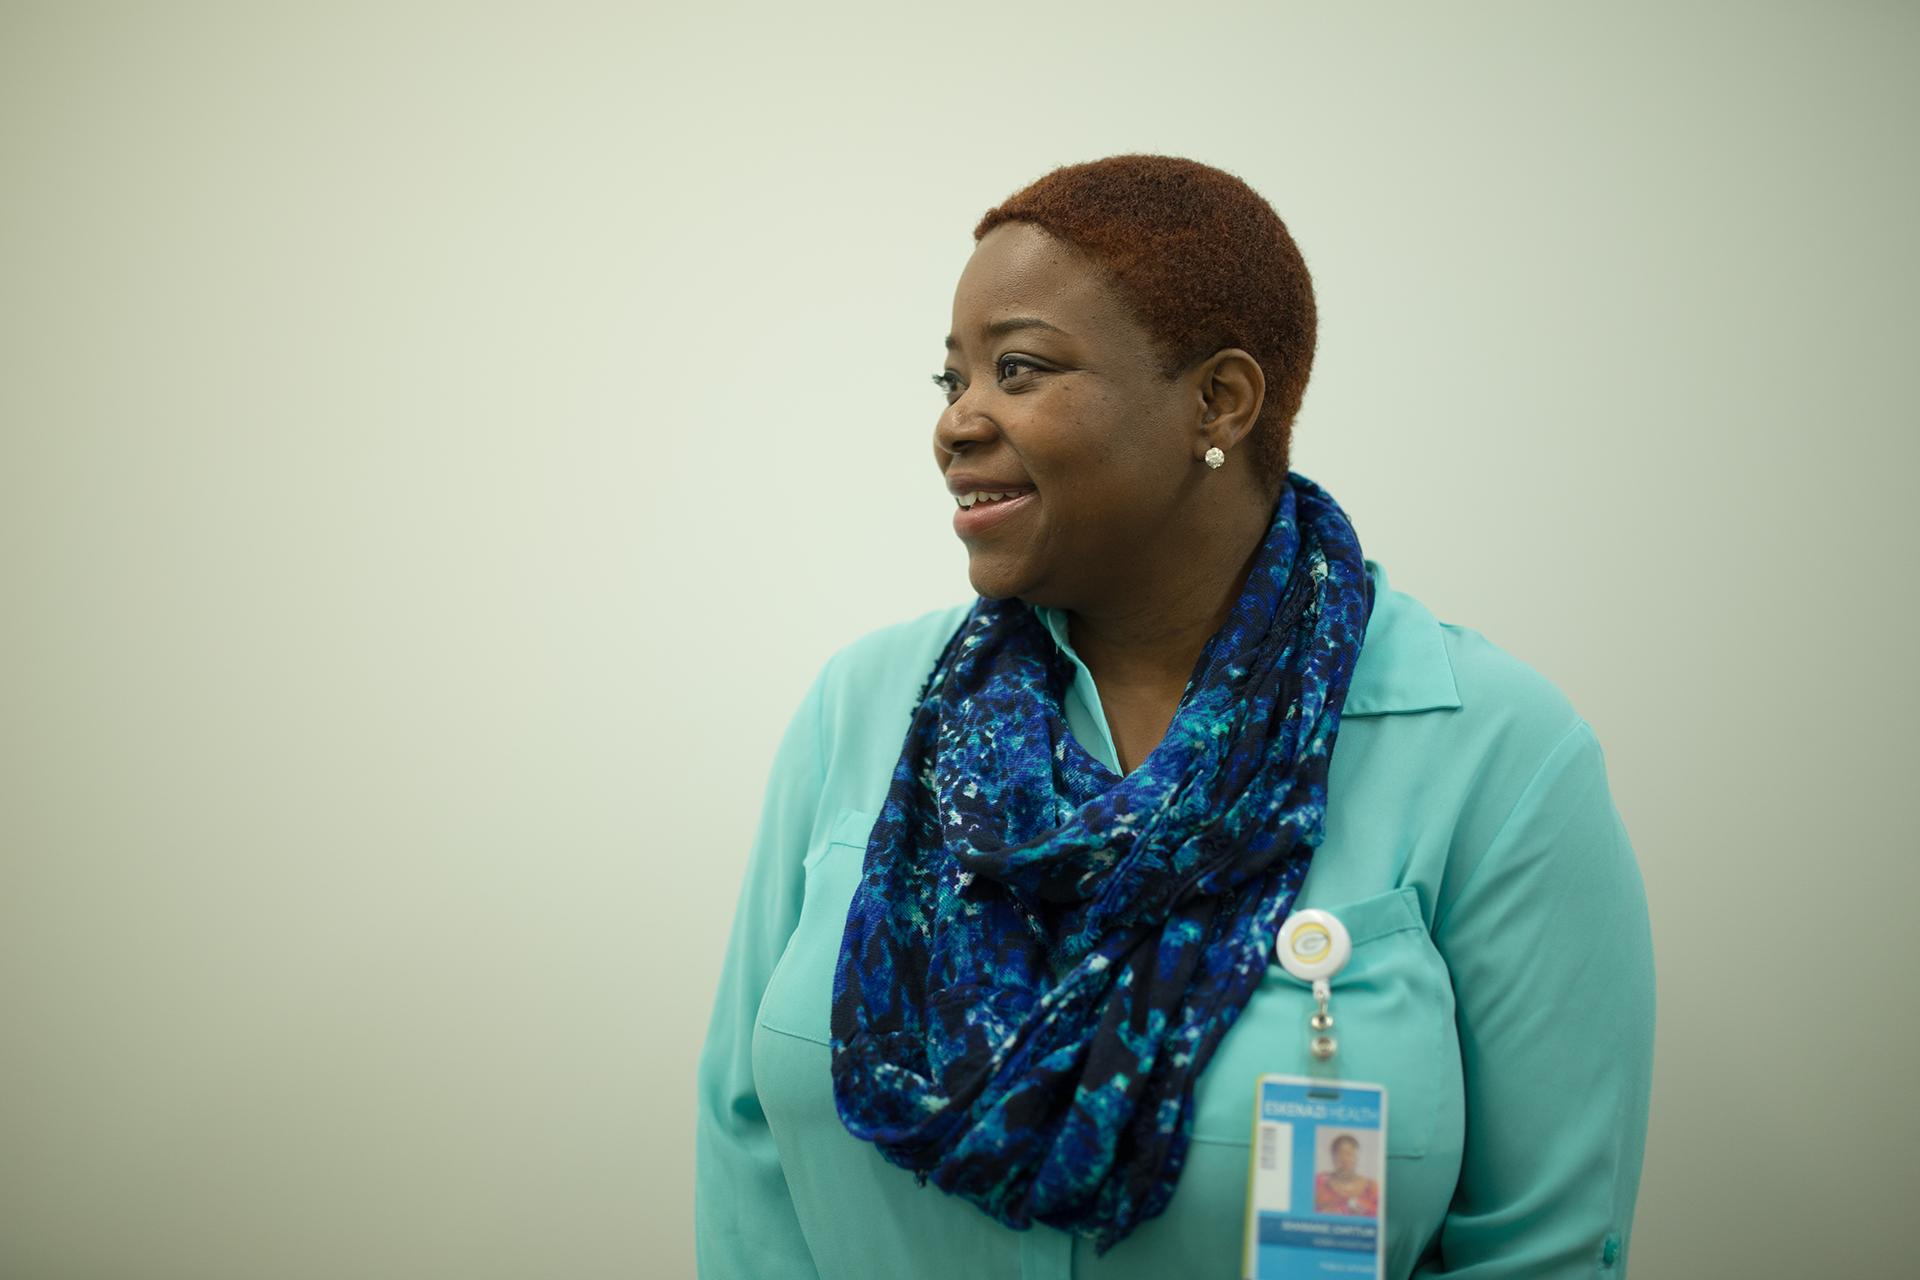 Denise is a graduate of the Nurse-Family Partnership program